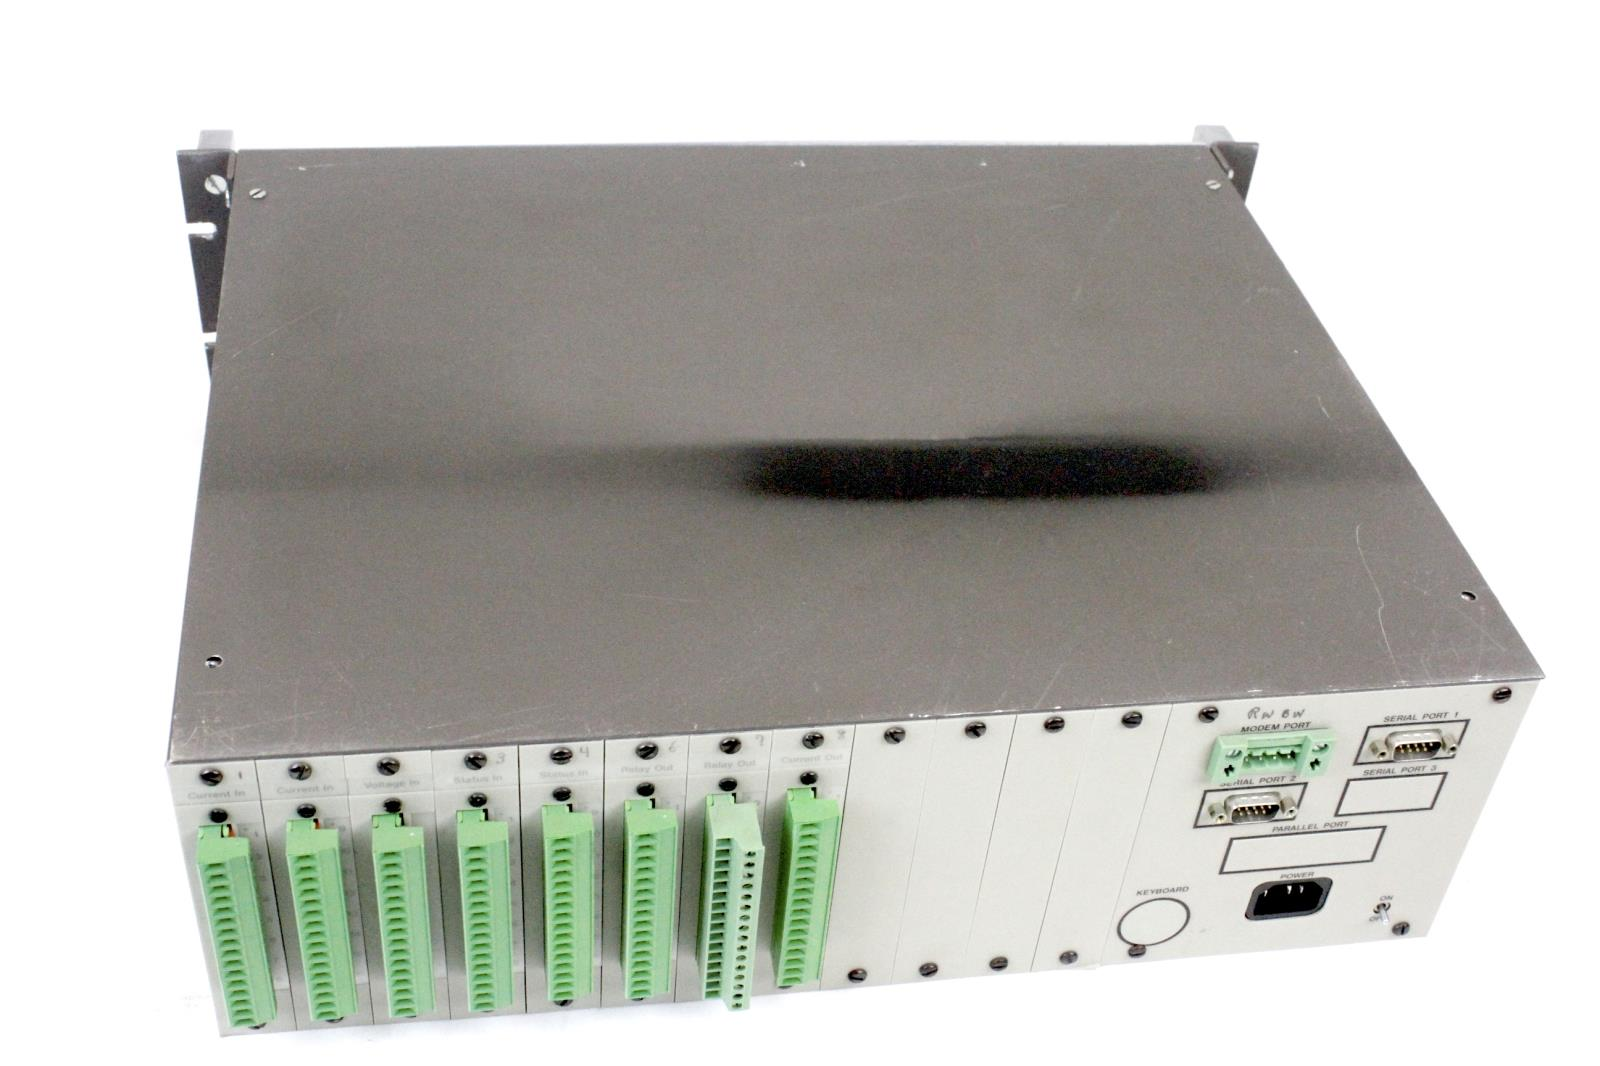 Agilent Technologies J6804a Dna Keysight Distributed Network Analyzer Ex J6851a Hats Collectibles